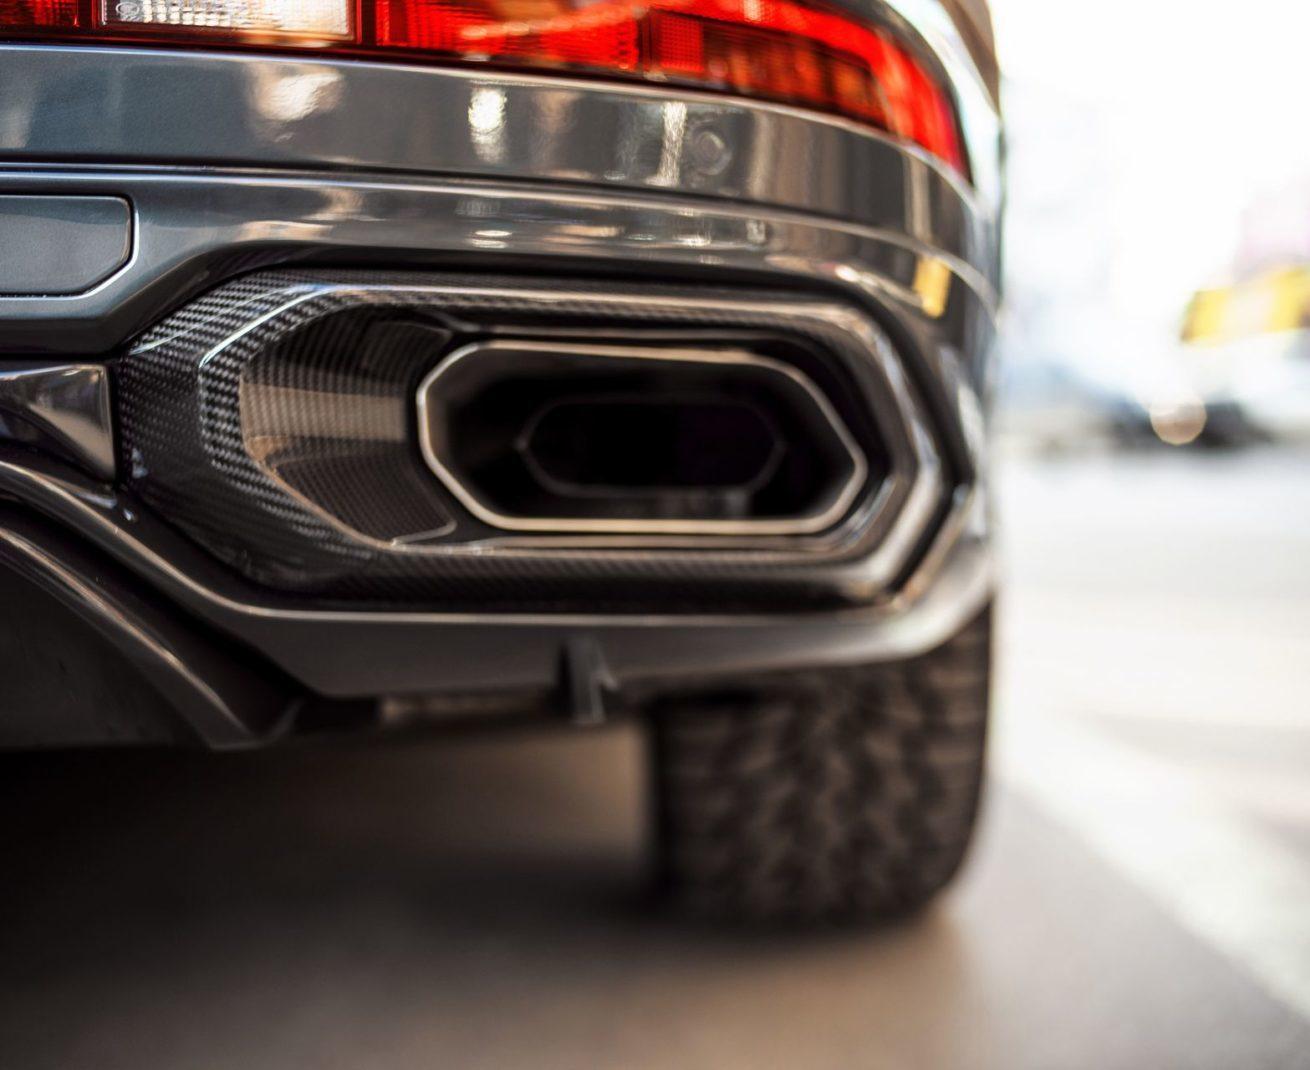 MTR Design Body Kit for Audi Q5/SQ5 carbon fiber